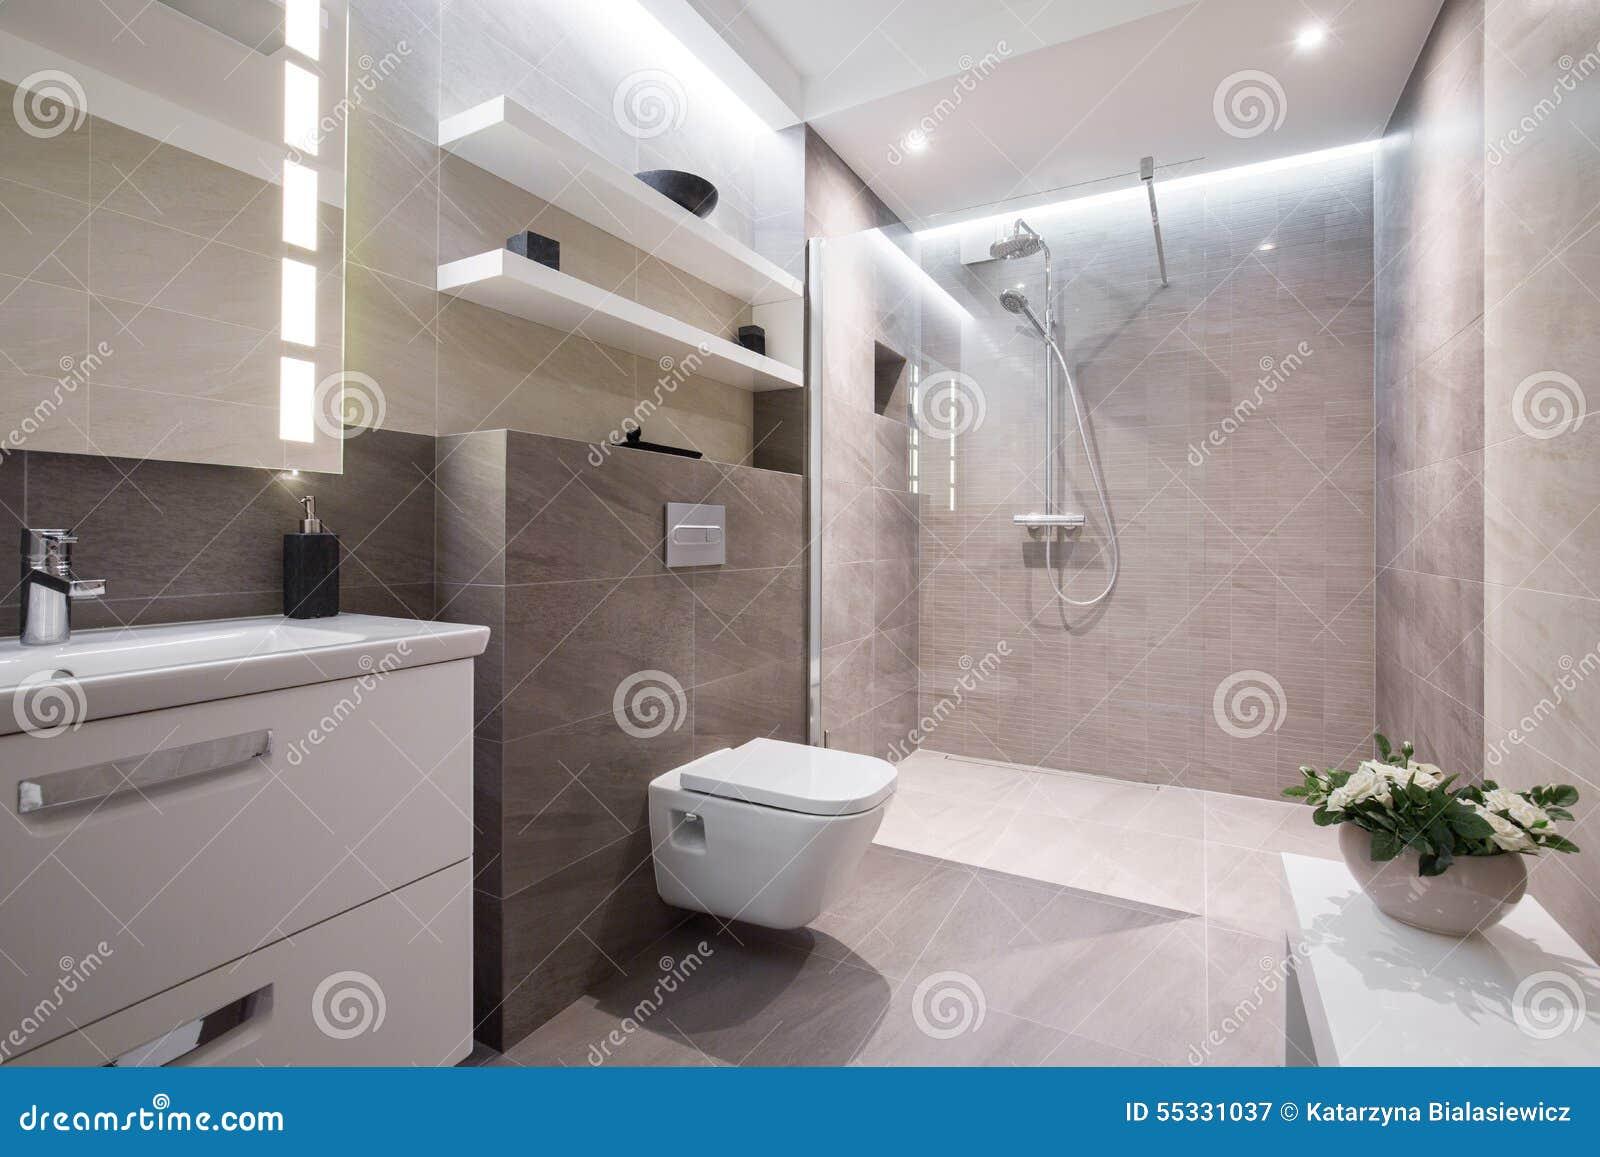 Exclusieve Moderne Badkamers Stock Afbeelding - Afbeelding bestaande ...